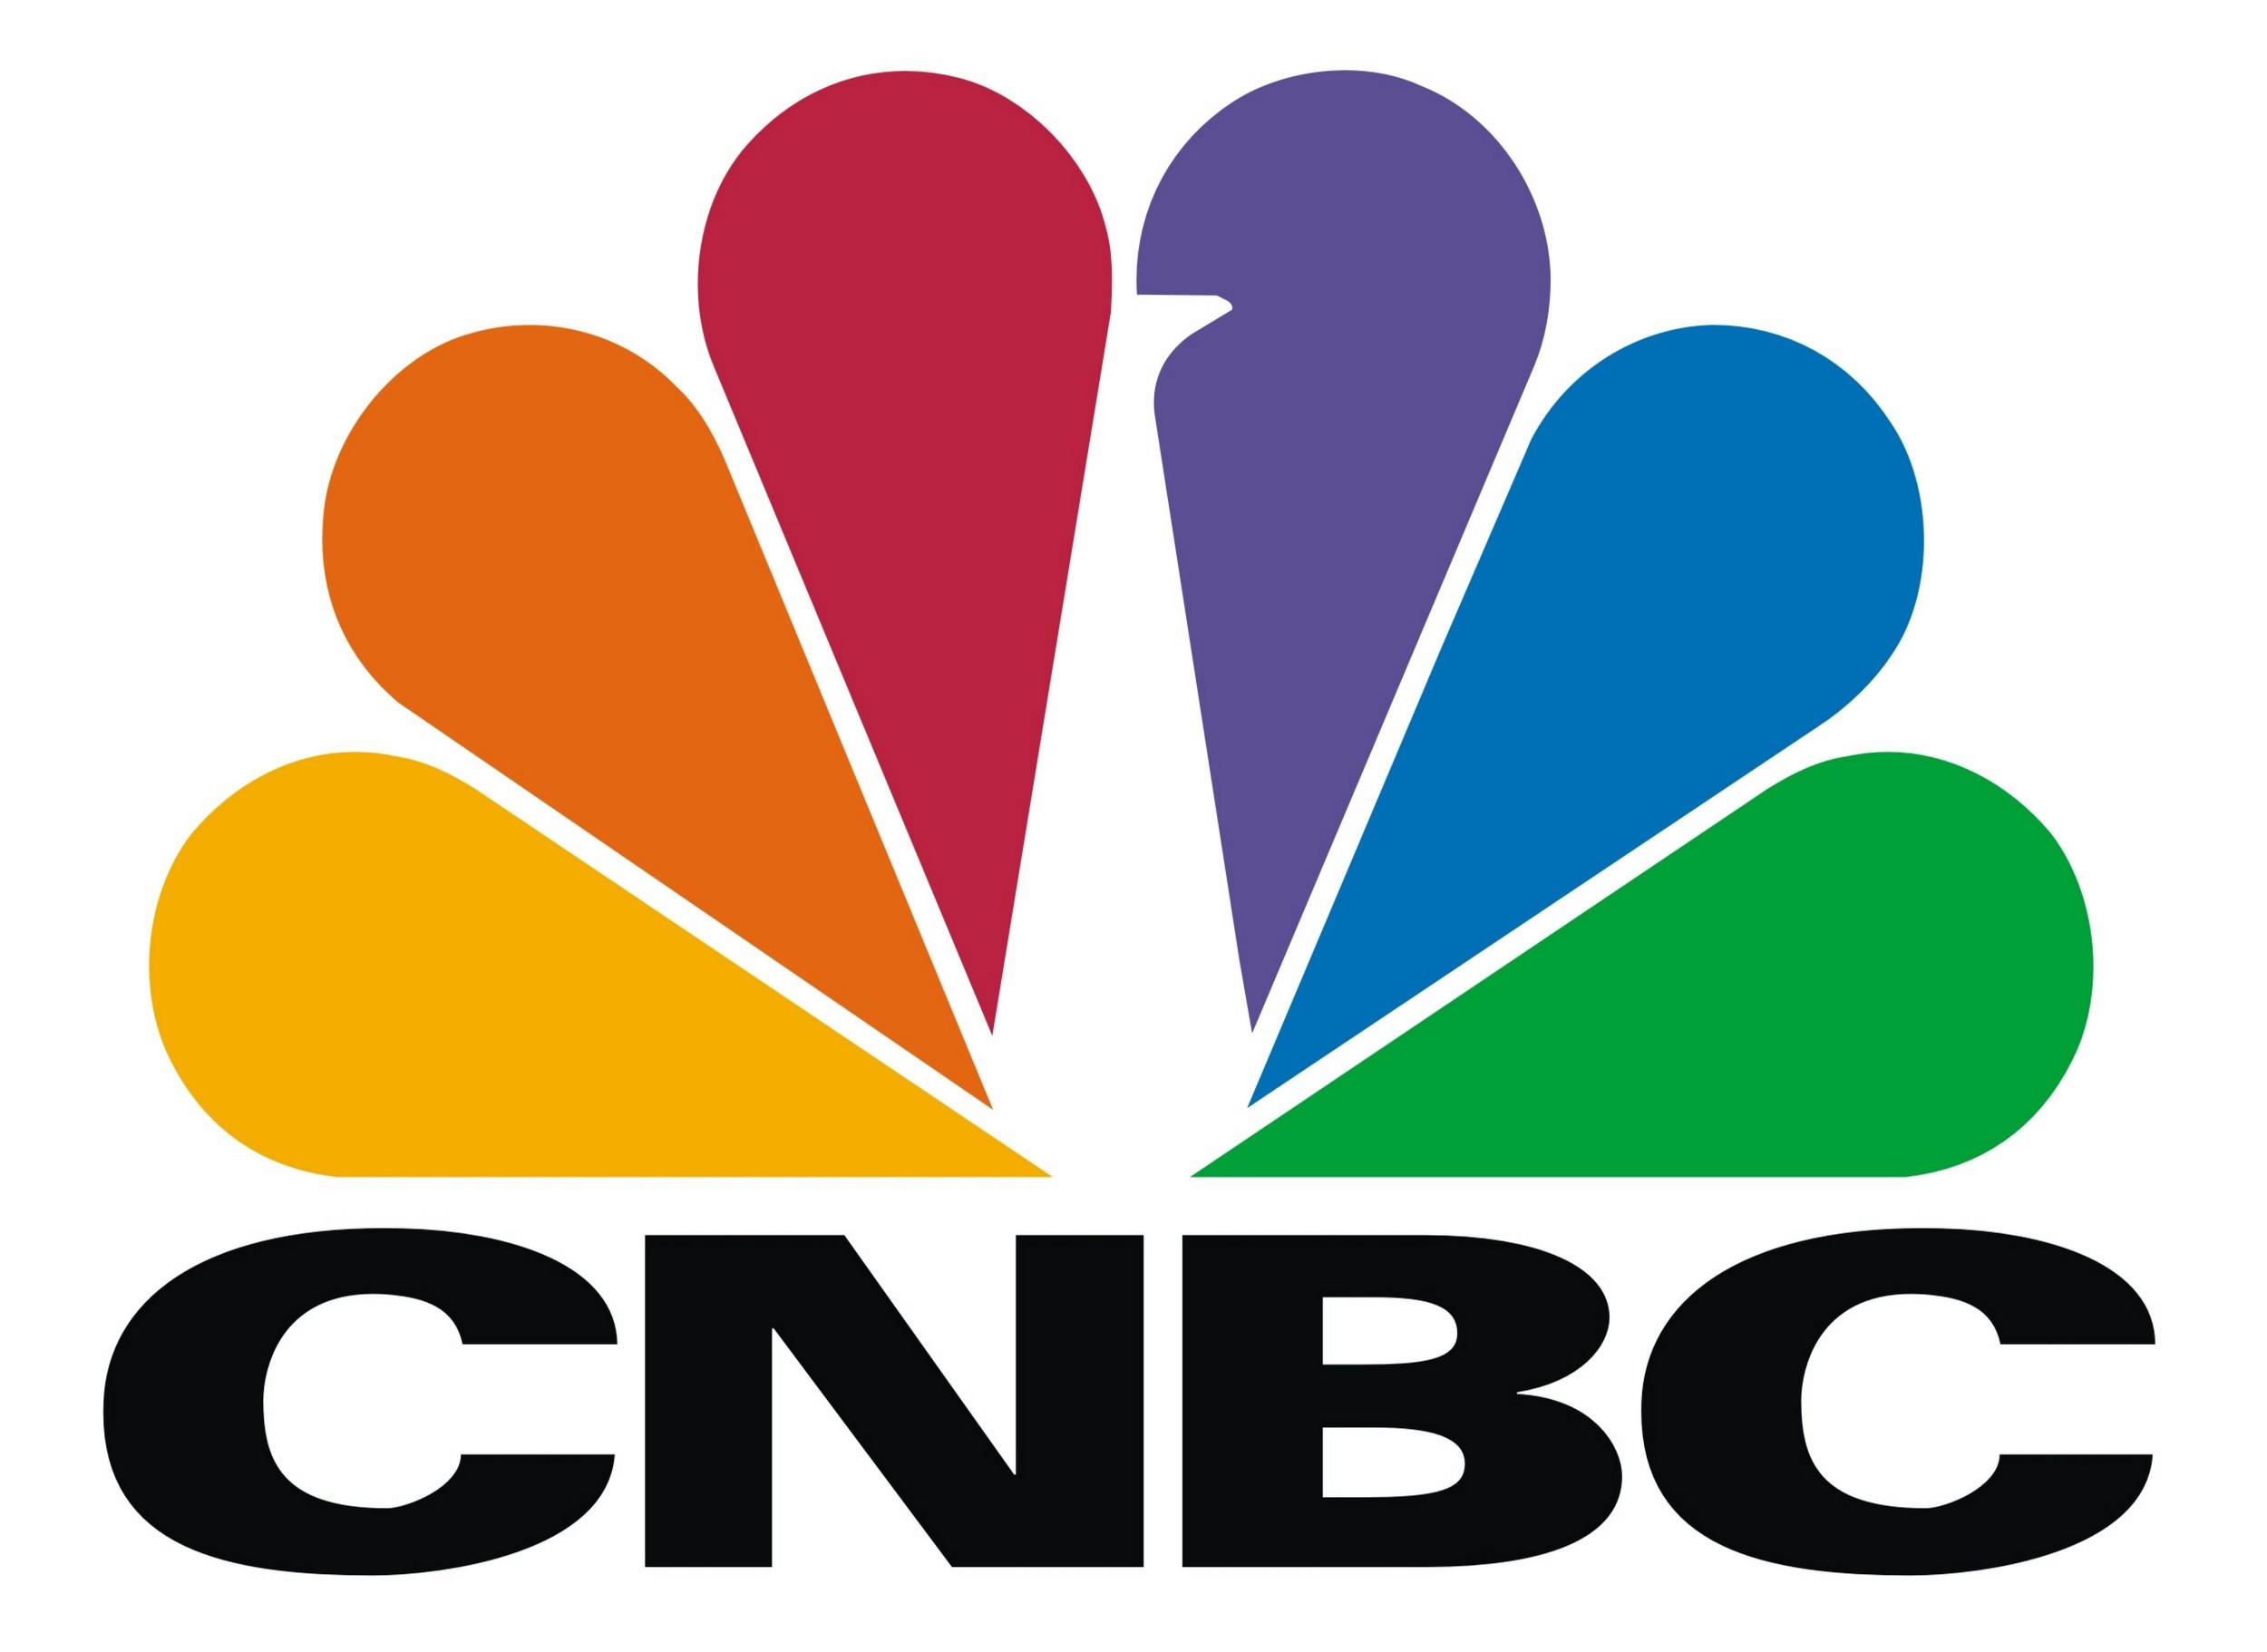 Cnbc logo press image 1458851025